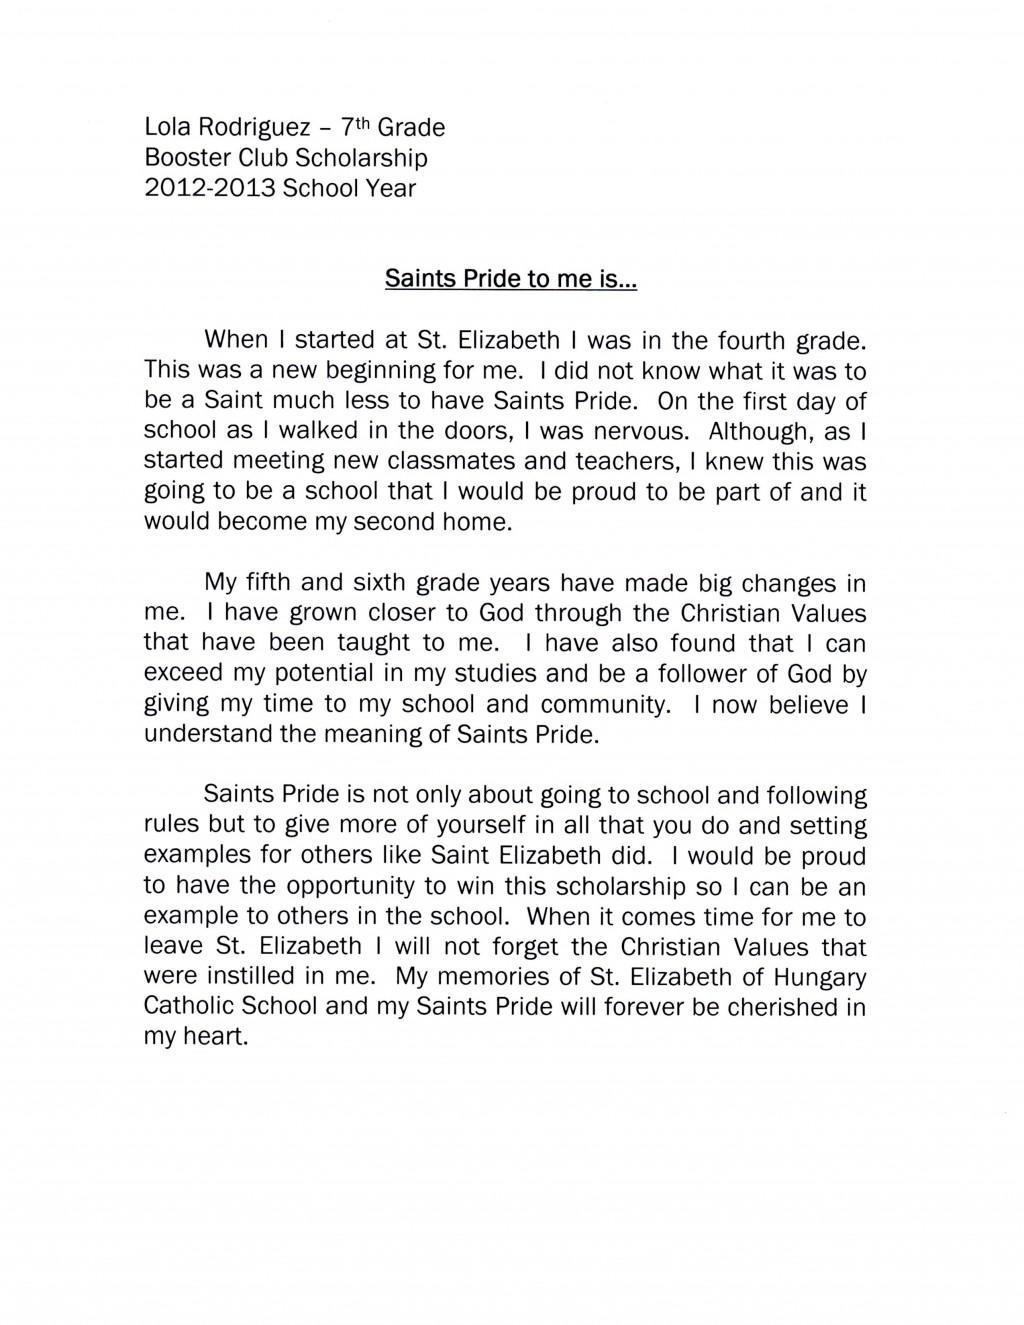 006 Lola Rodriguez National Honor Society Application Essay Sensational Junior Ideas Examples Large